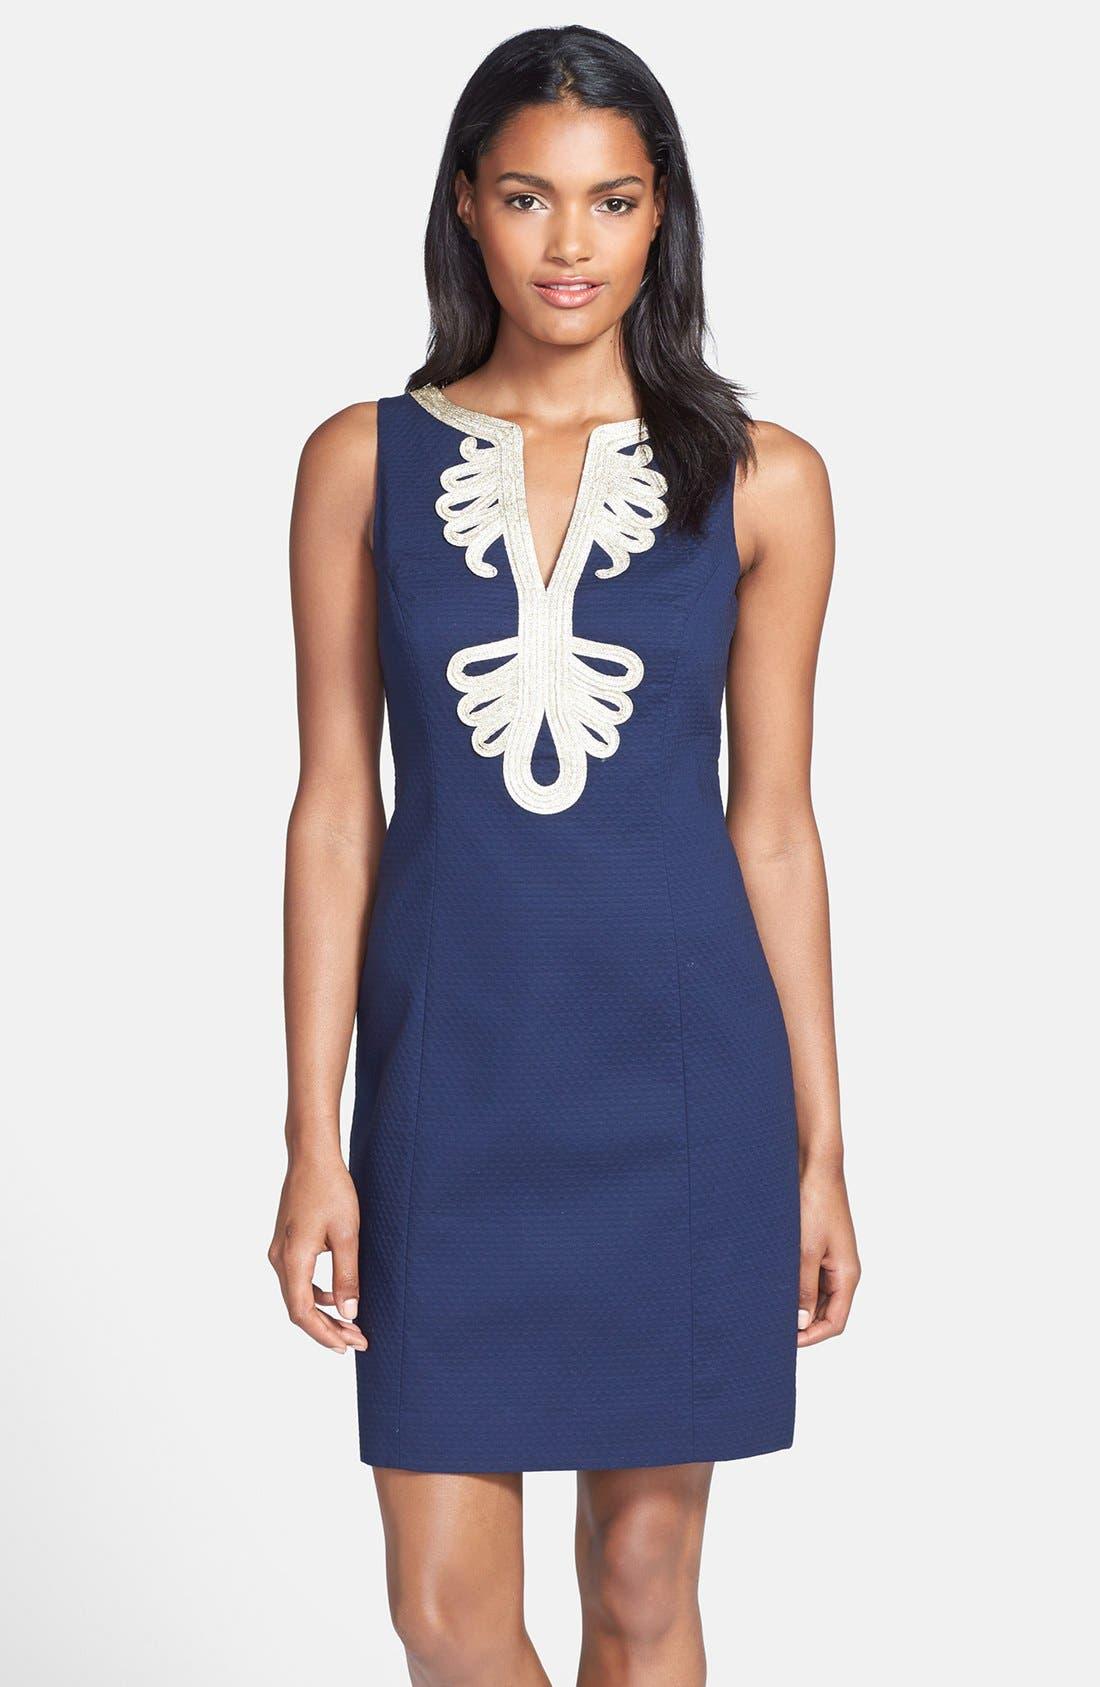 Main Image - Lilly Pulitzer® 'Janice' Soutache Cotton Shift Dress